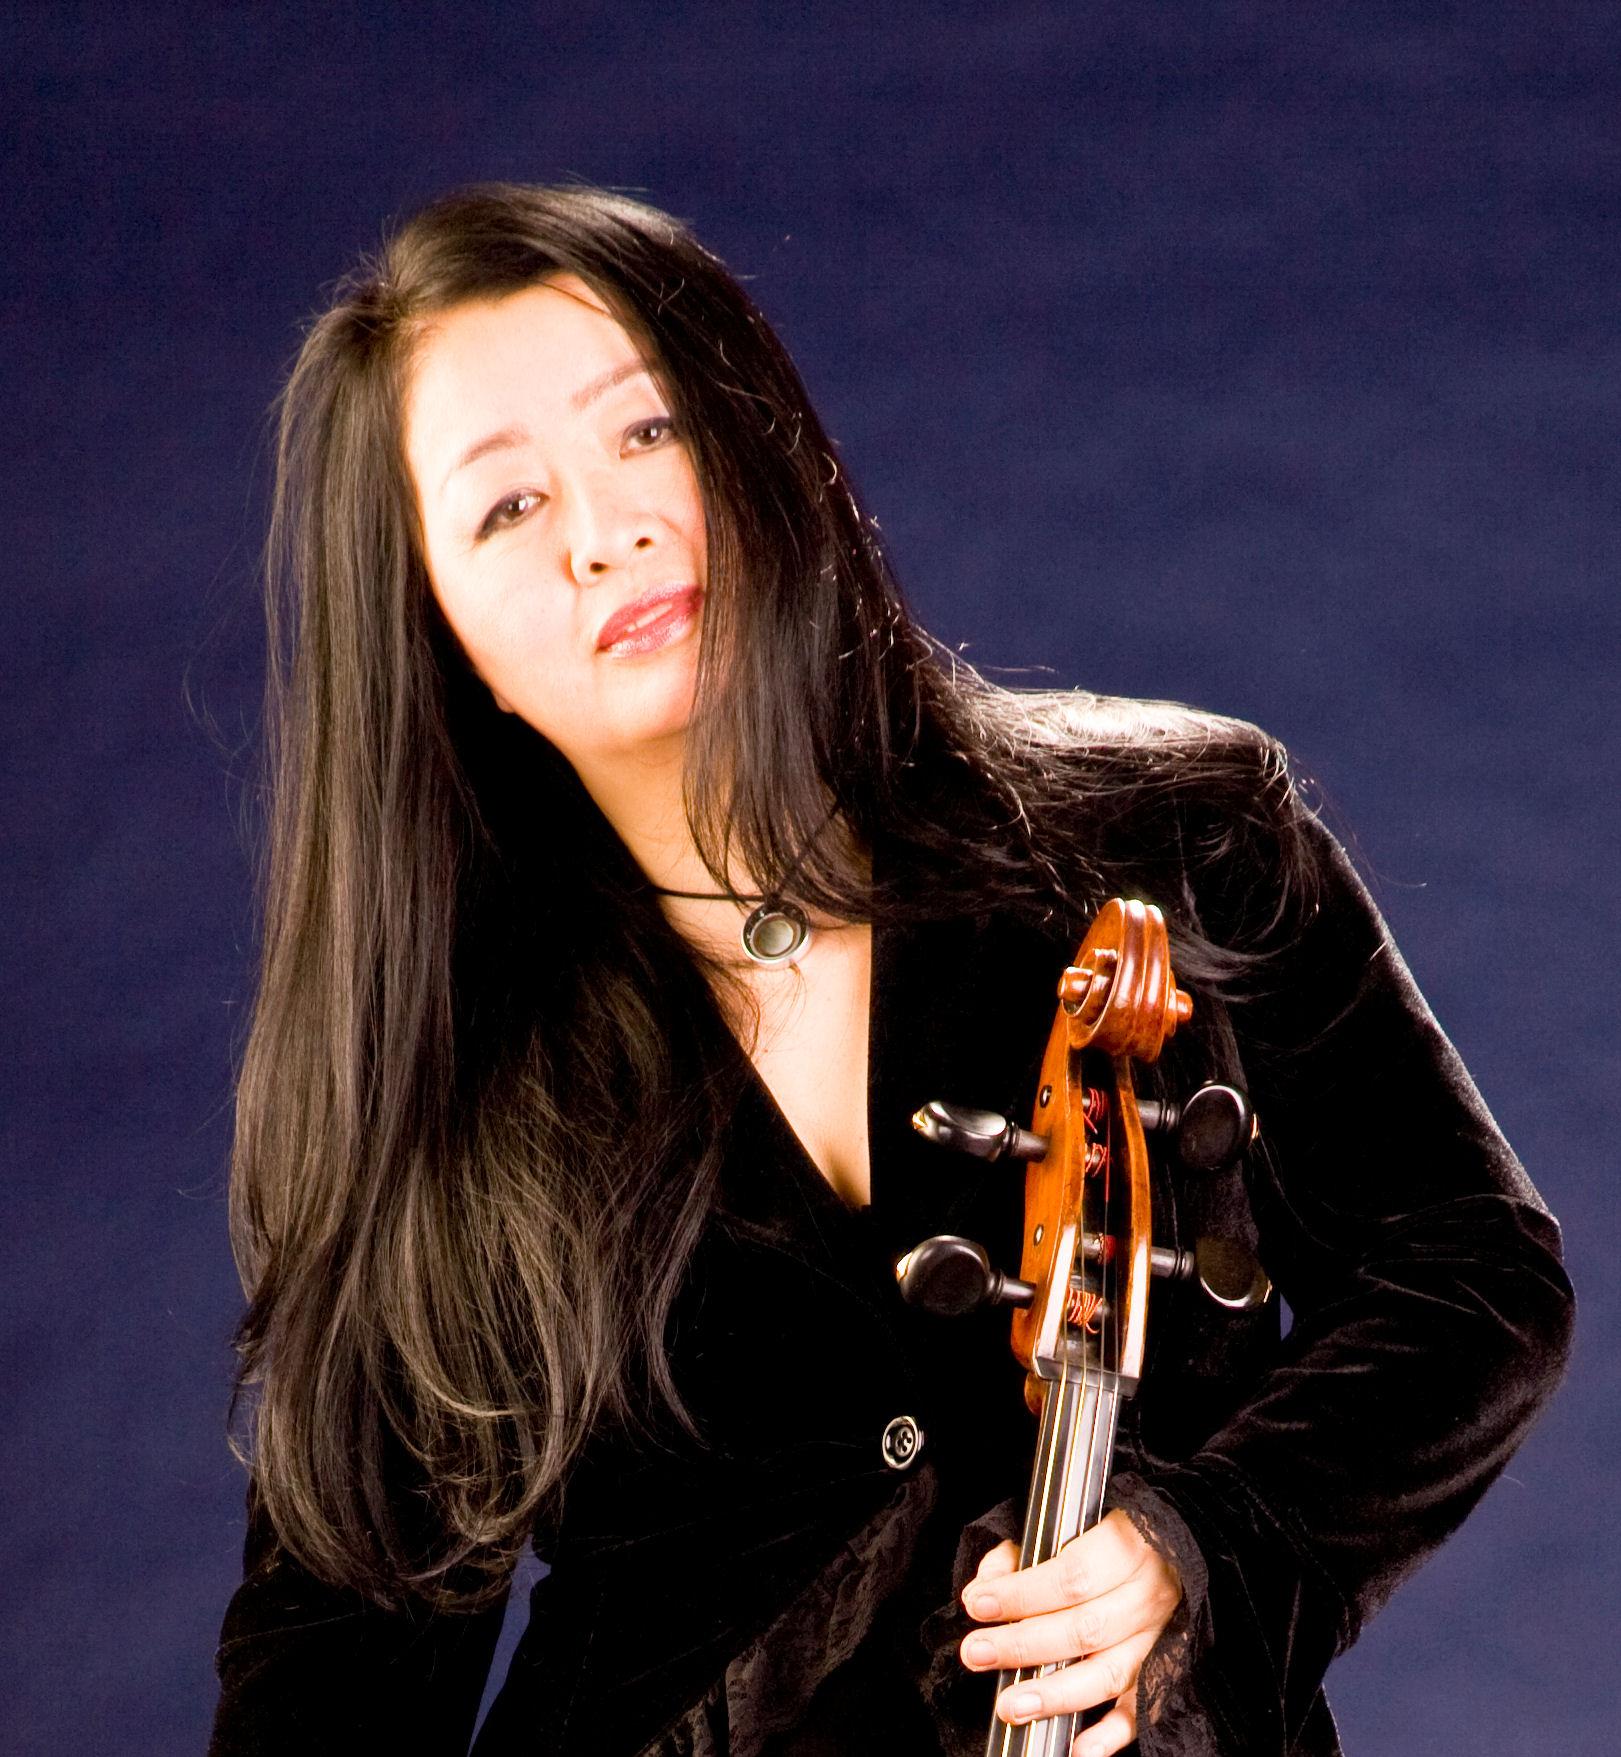 Cécilia Tsan